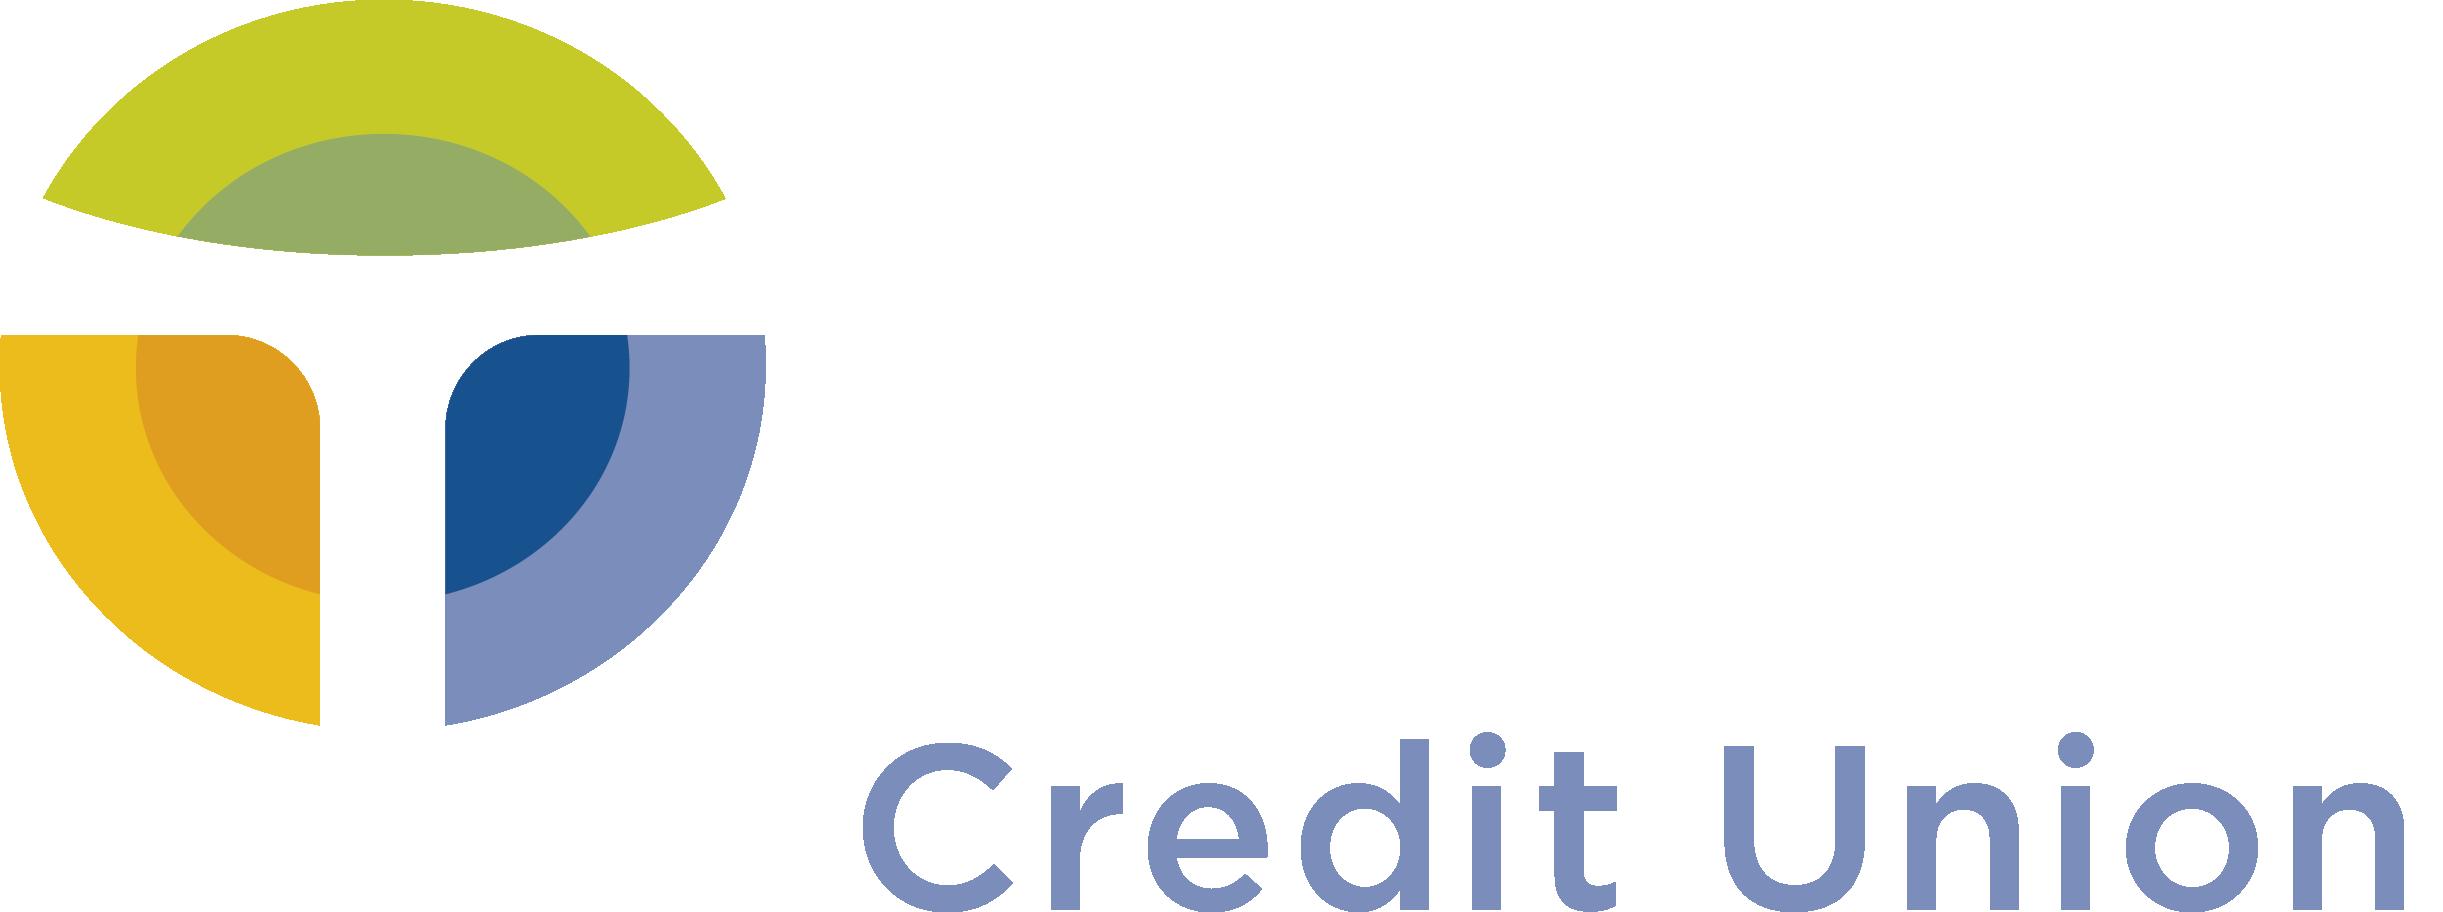 Telhio Logo Image